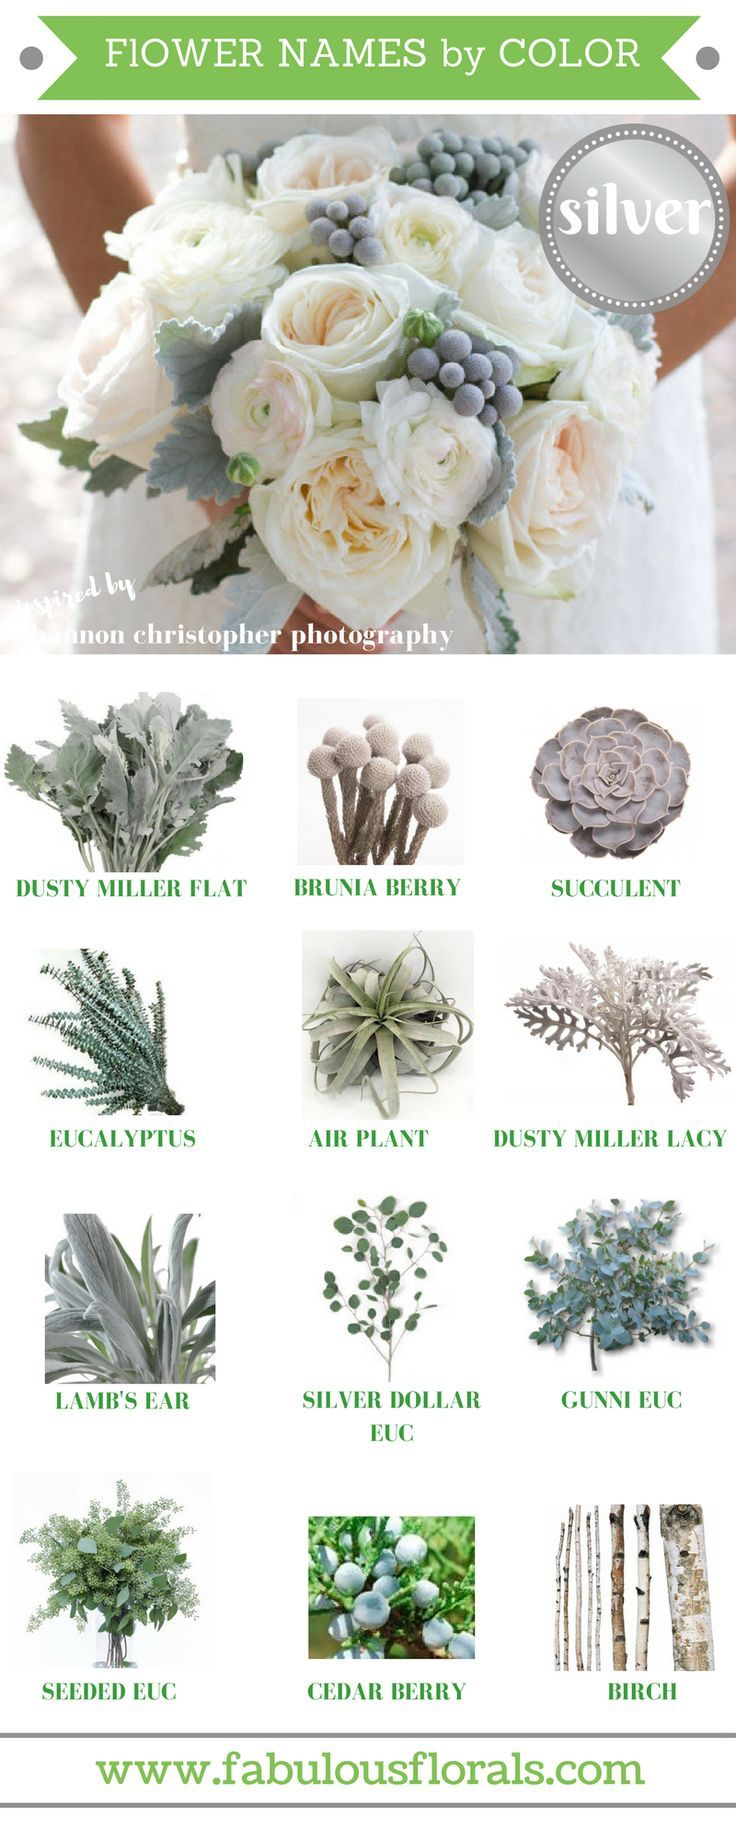 Traditional wedding decor ideas 2018  Natural Silver grey flower accents  Wedding flower ideas  Non